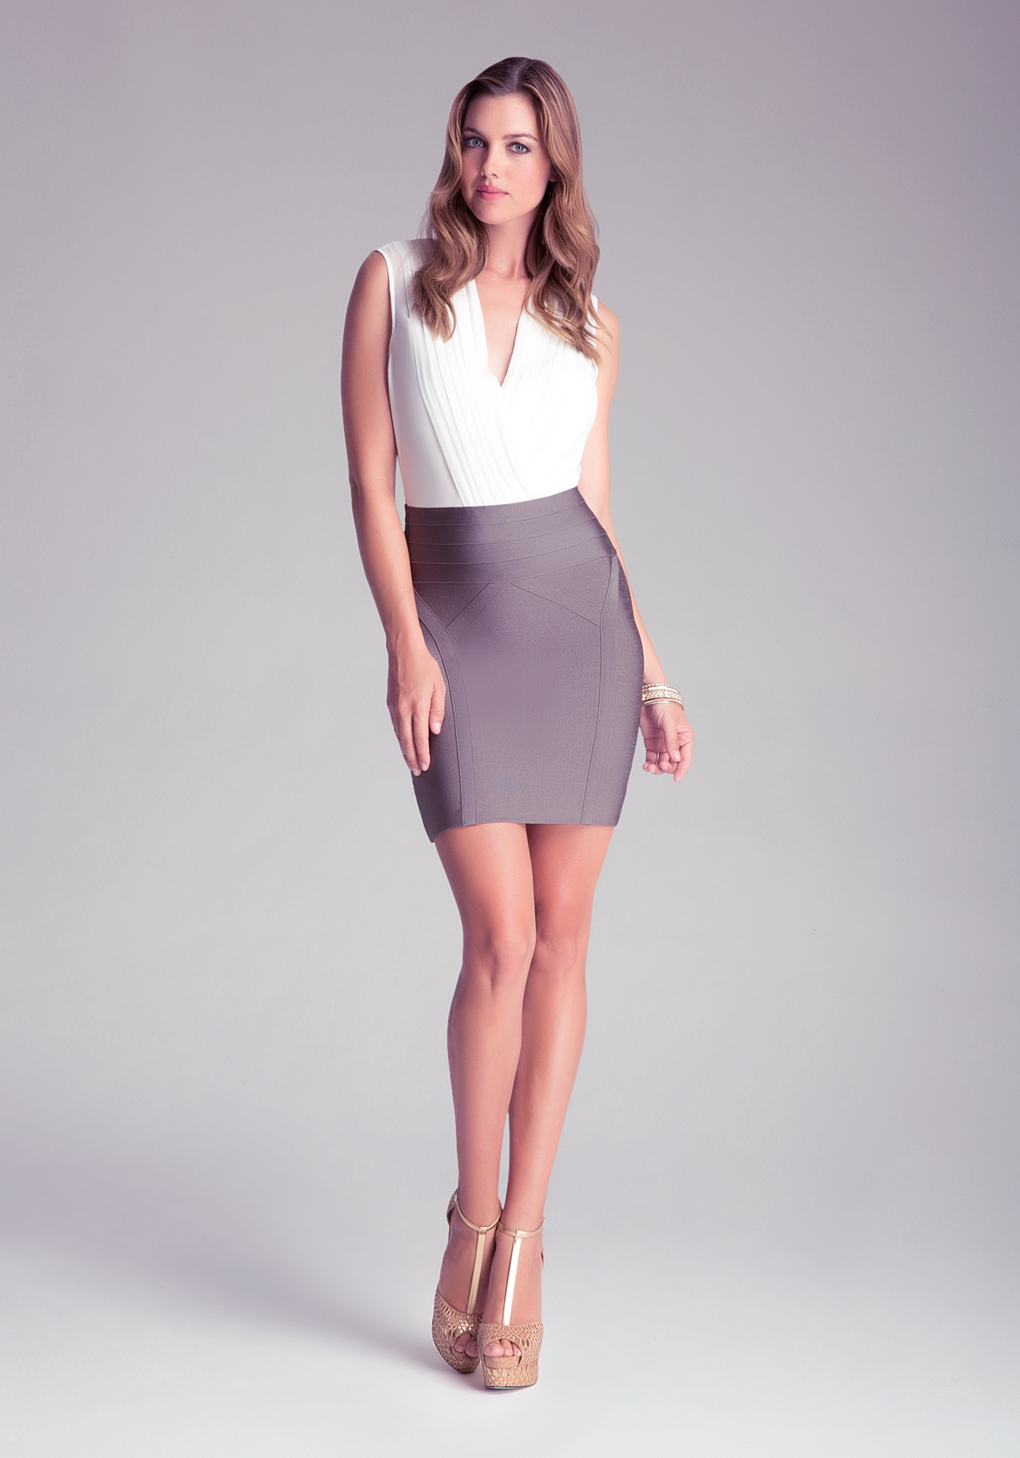 Bebe High Waist Bodycon Skirt in Green | Lyst